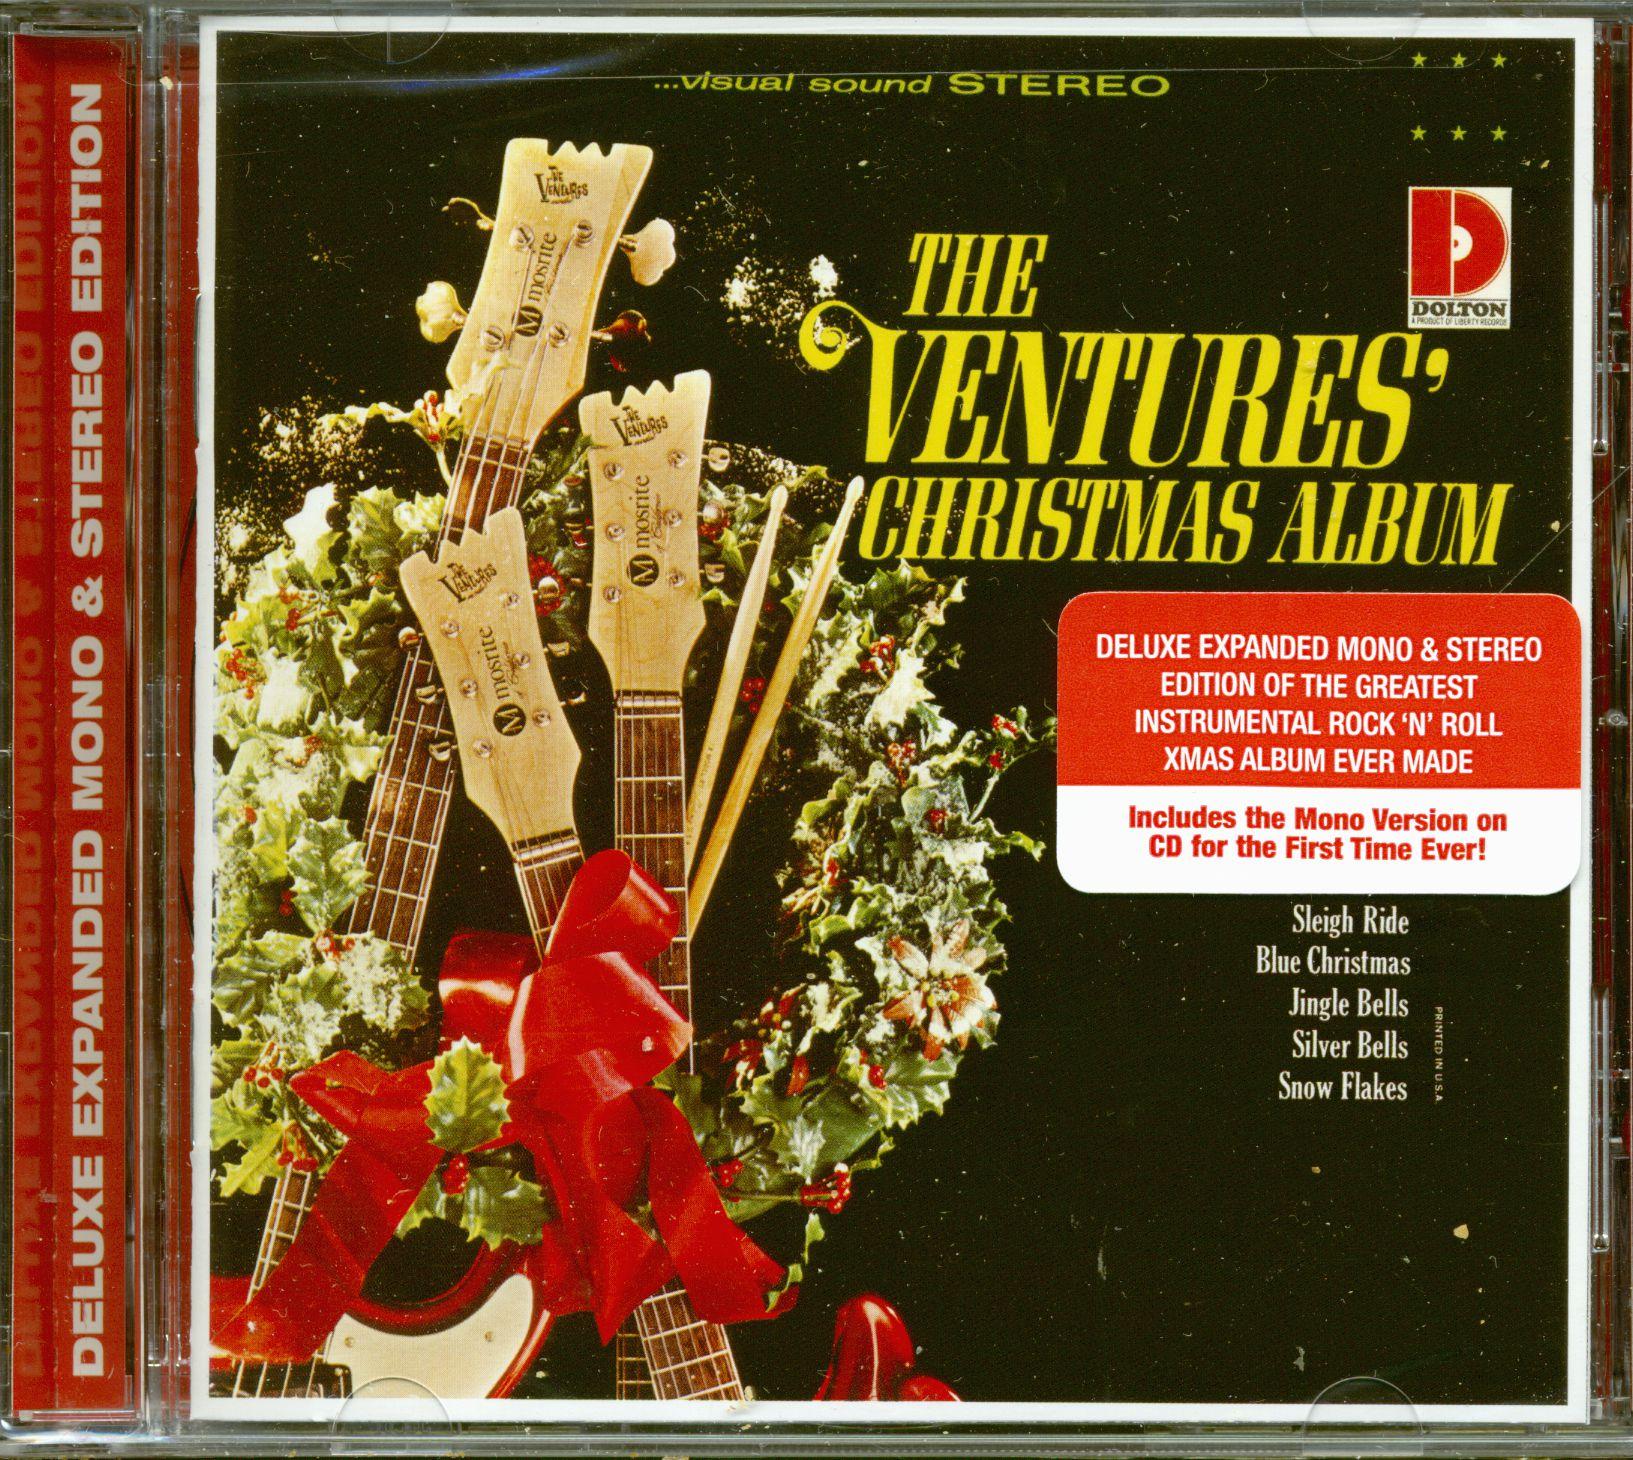 The Ventures CD: The Ventures\' Christmas Album (CD) - Bear Family ...